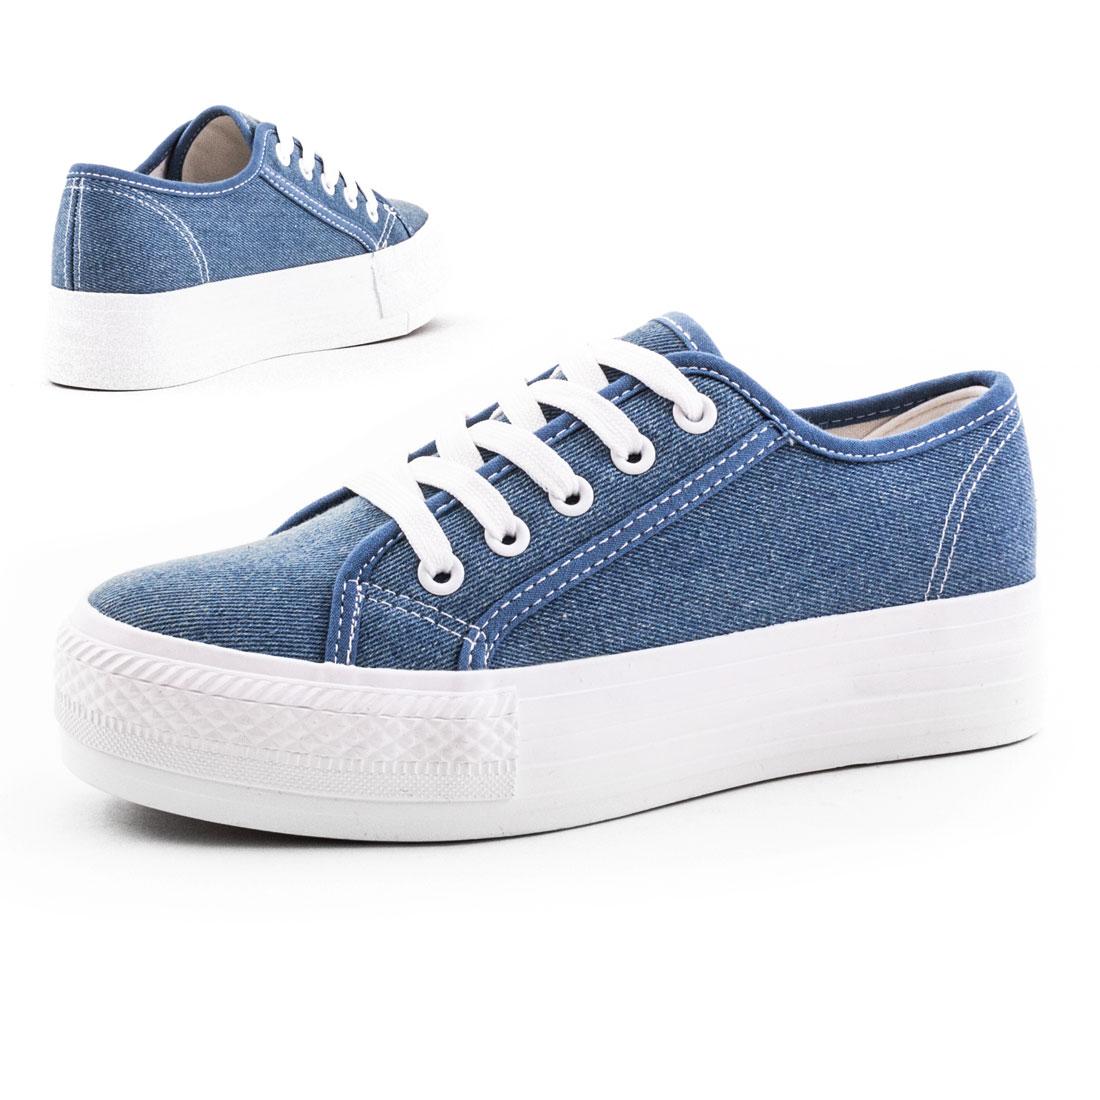 Sneaker Damenschuhe NEU low Jeans Turnschuhe Freizeitschuhe 36 37 38 39 40 41